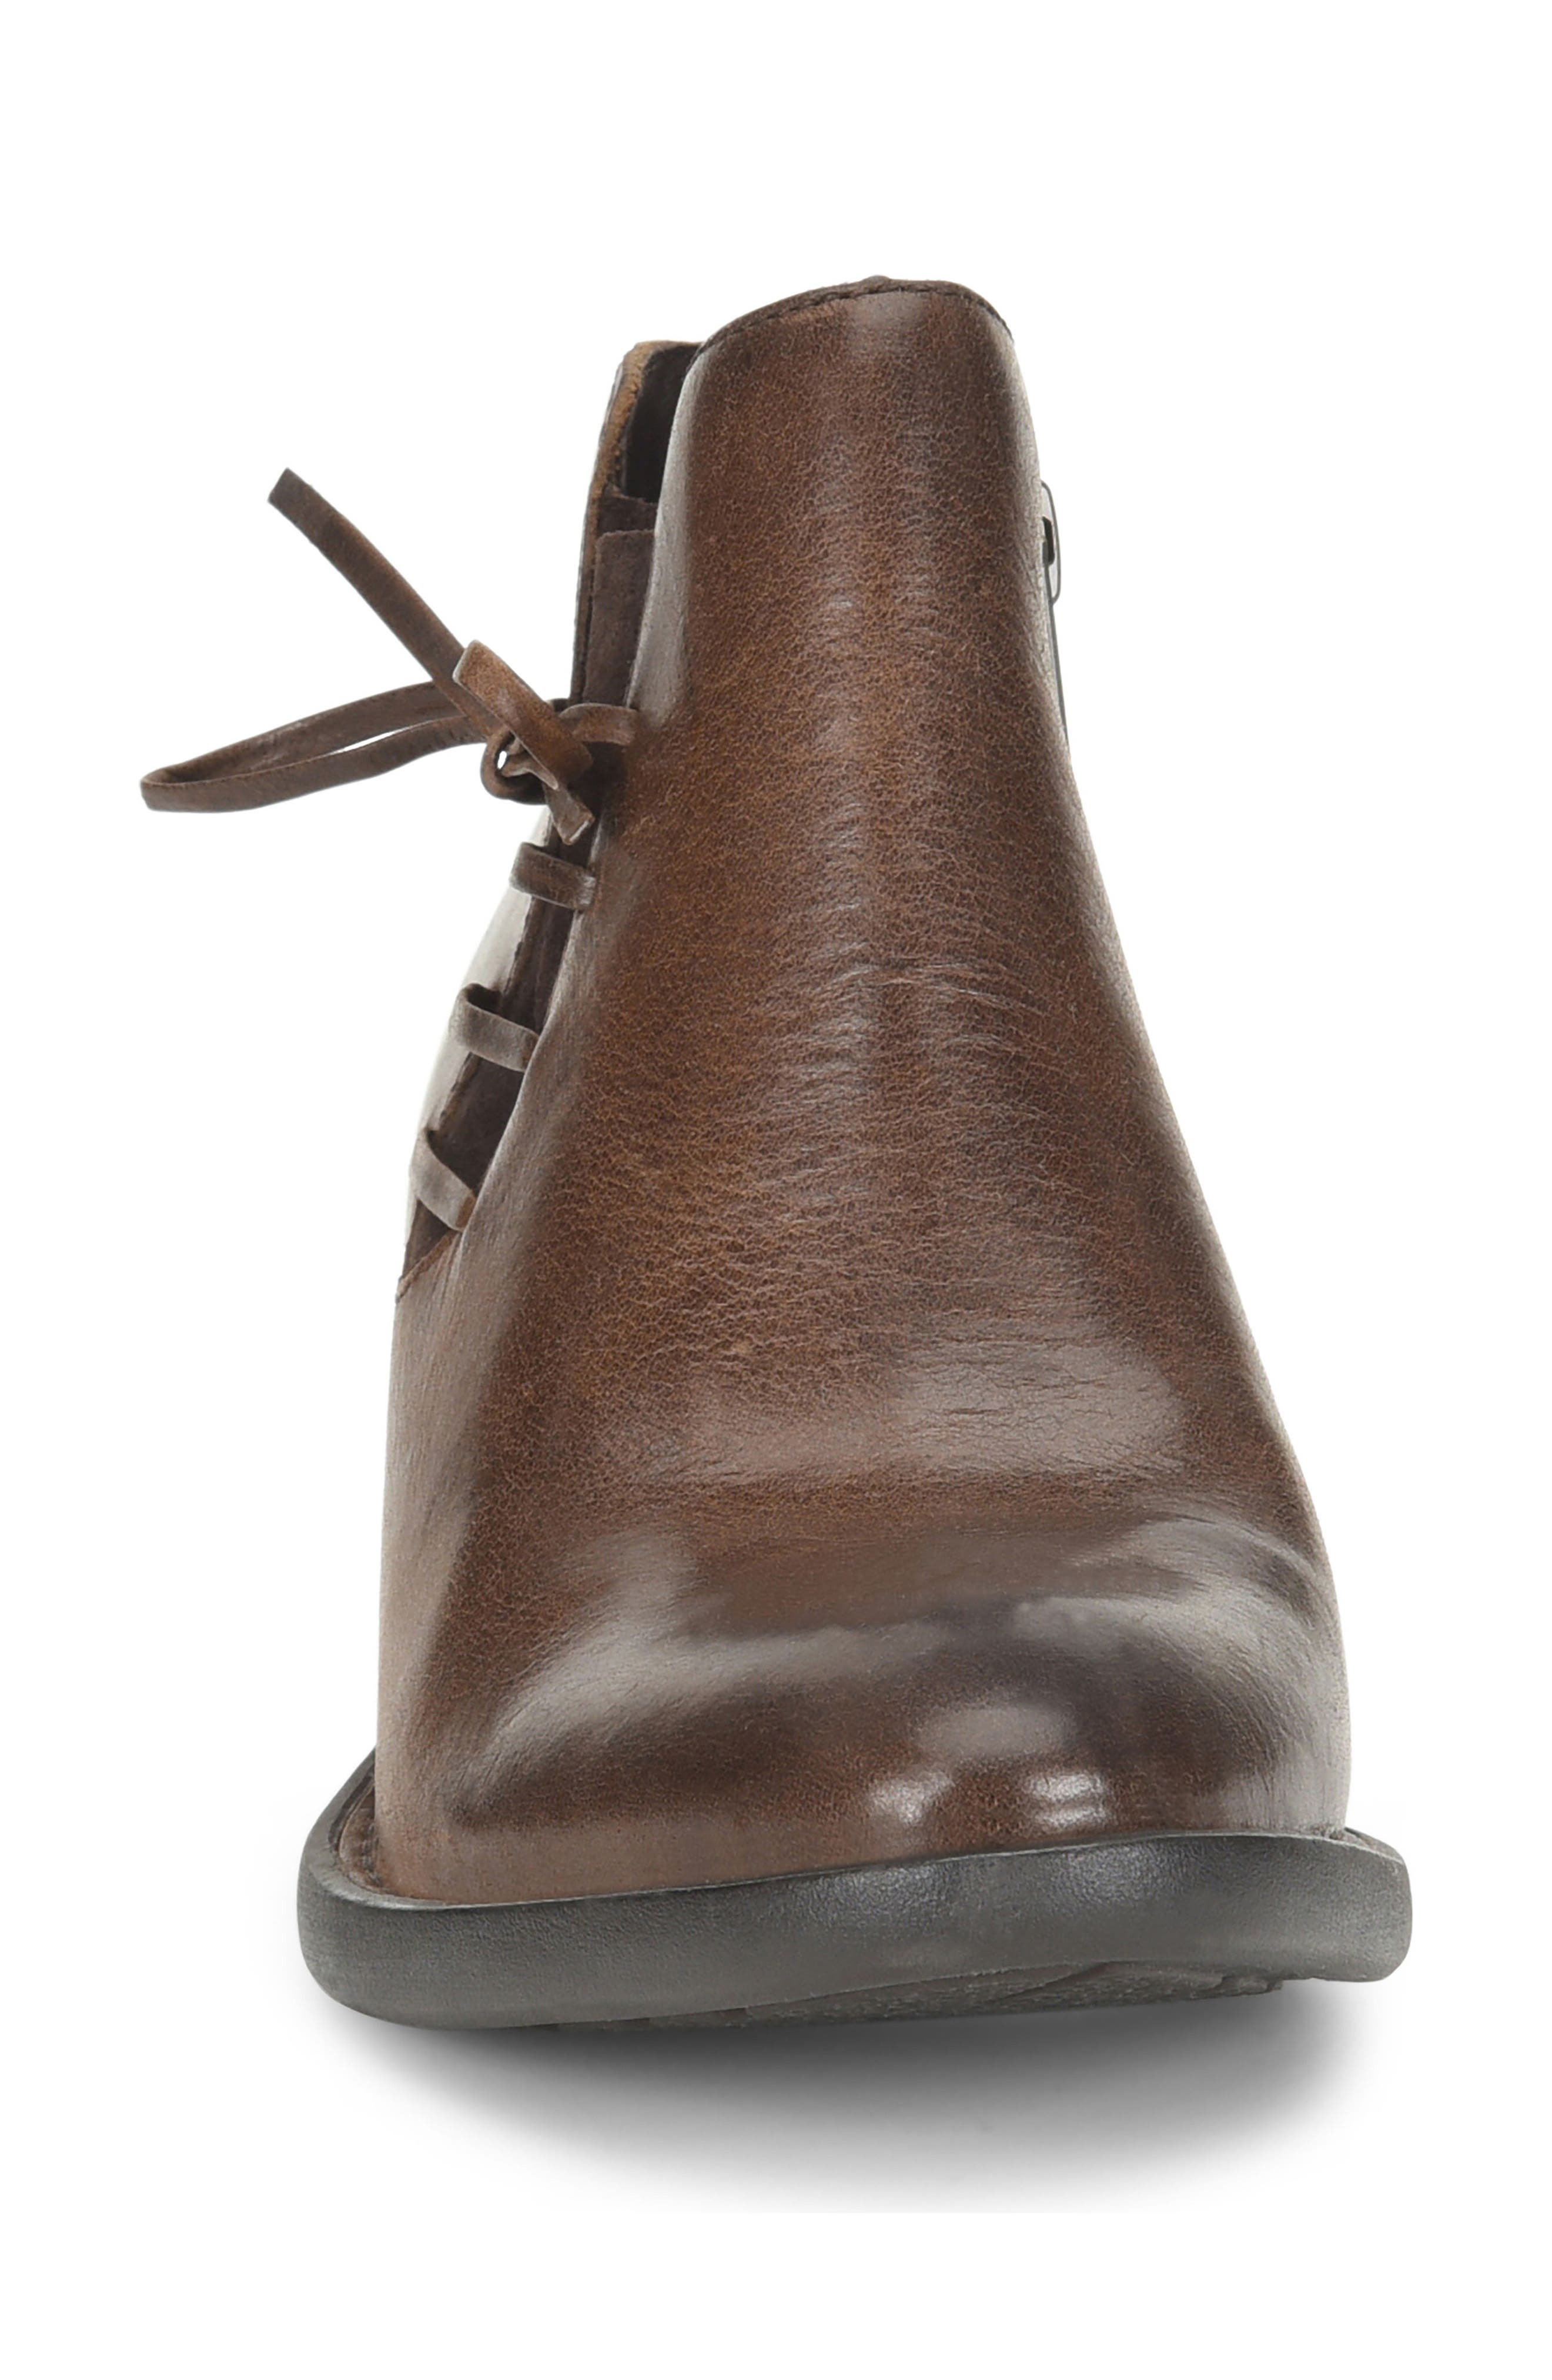 Bowlen Bootie,                             Alternate thumbnail 4, color,                             Brown Leather